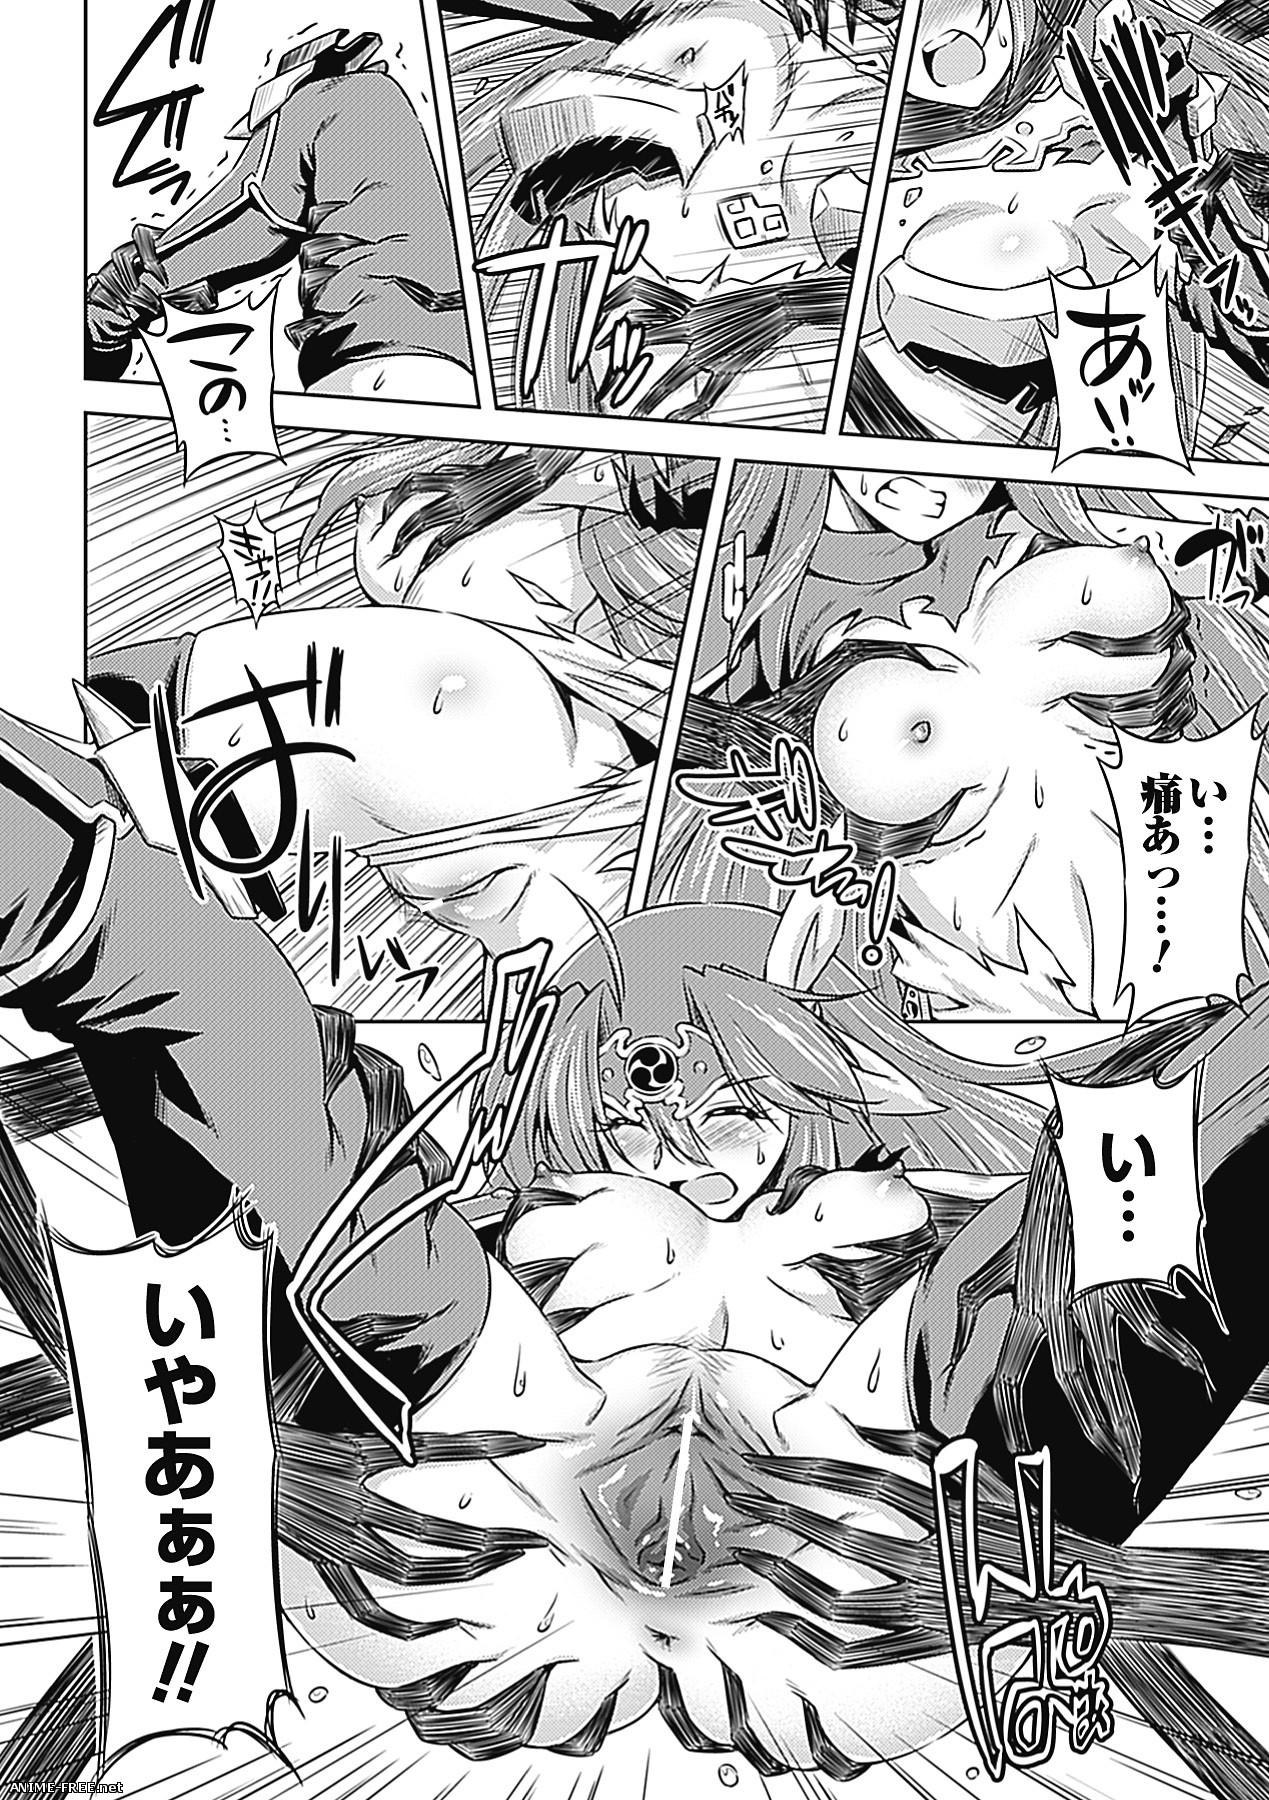 Megami Crisis - сборник хентай манги [Cen] [JAP] Manga Hentai